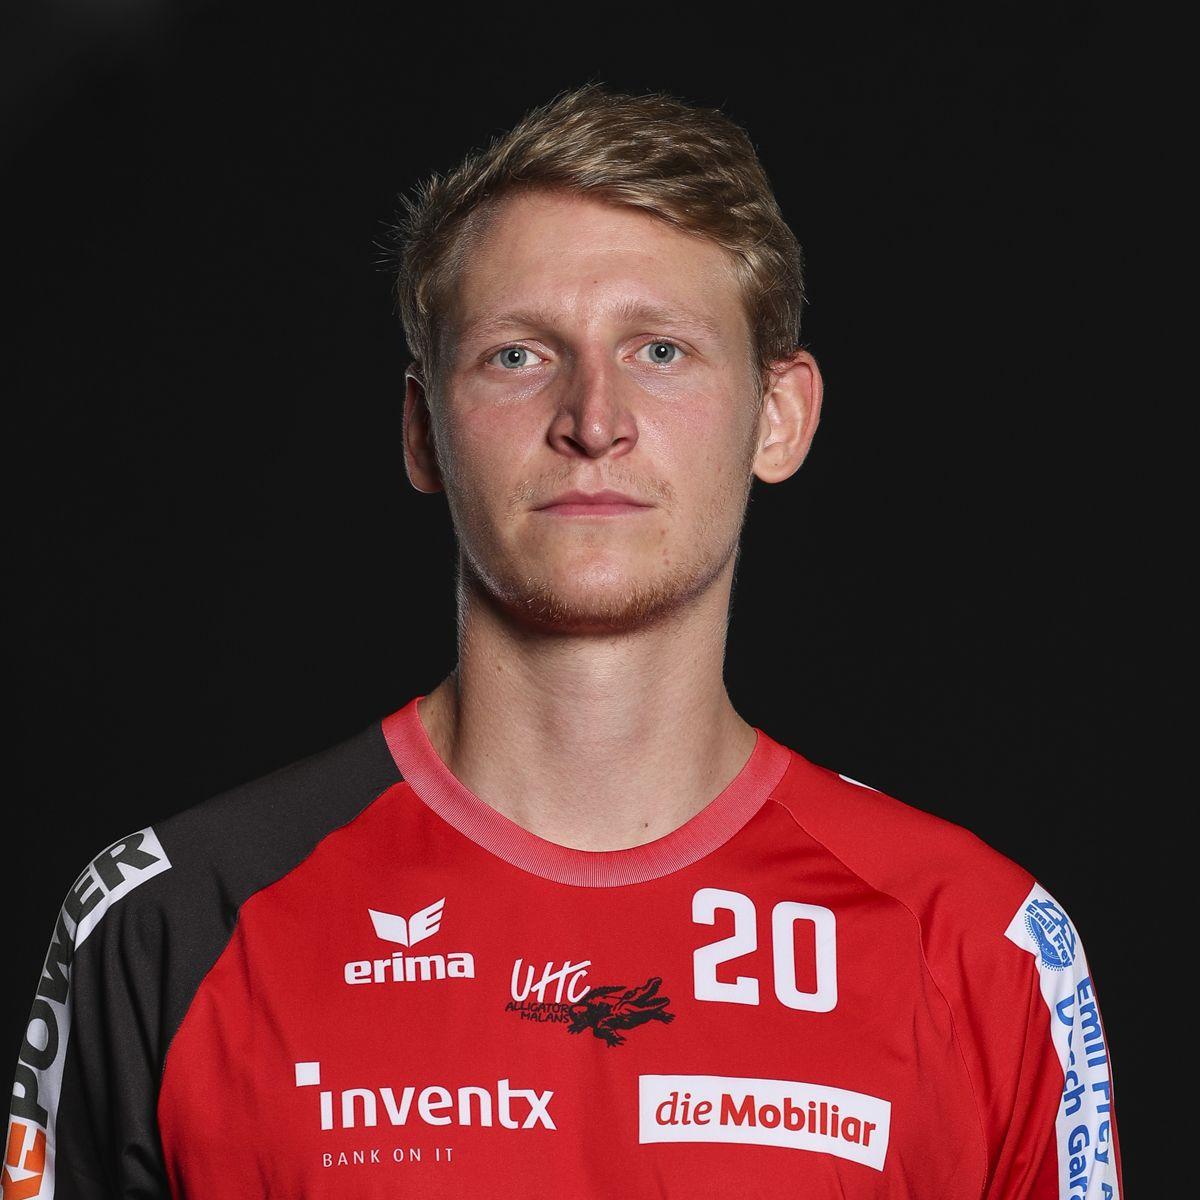 Oscar Eriksson-Elfsberg #20_NLA_UHC Alligator Malans_Saison 2019-2020_1200x1200_01.jpg